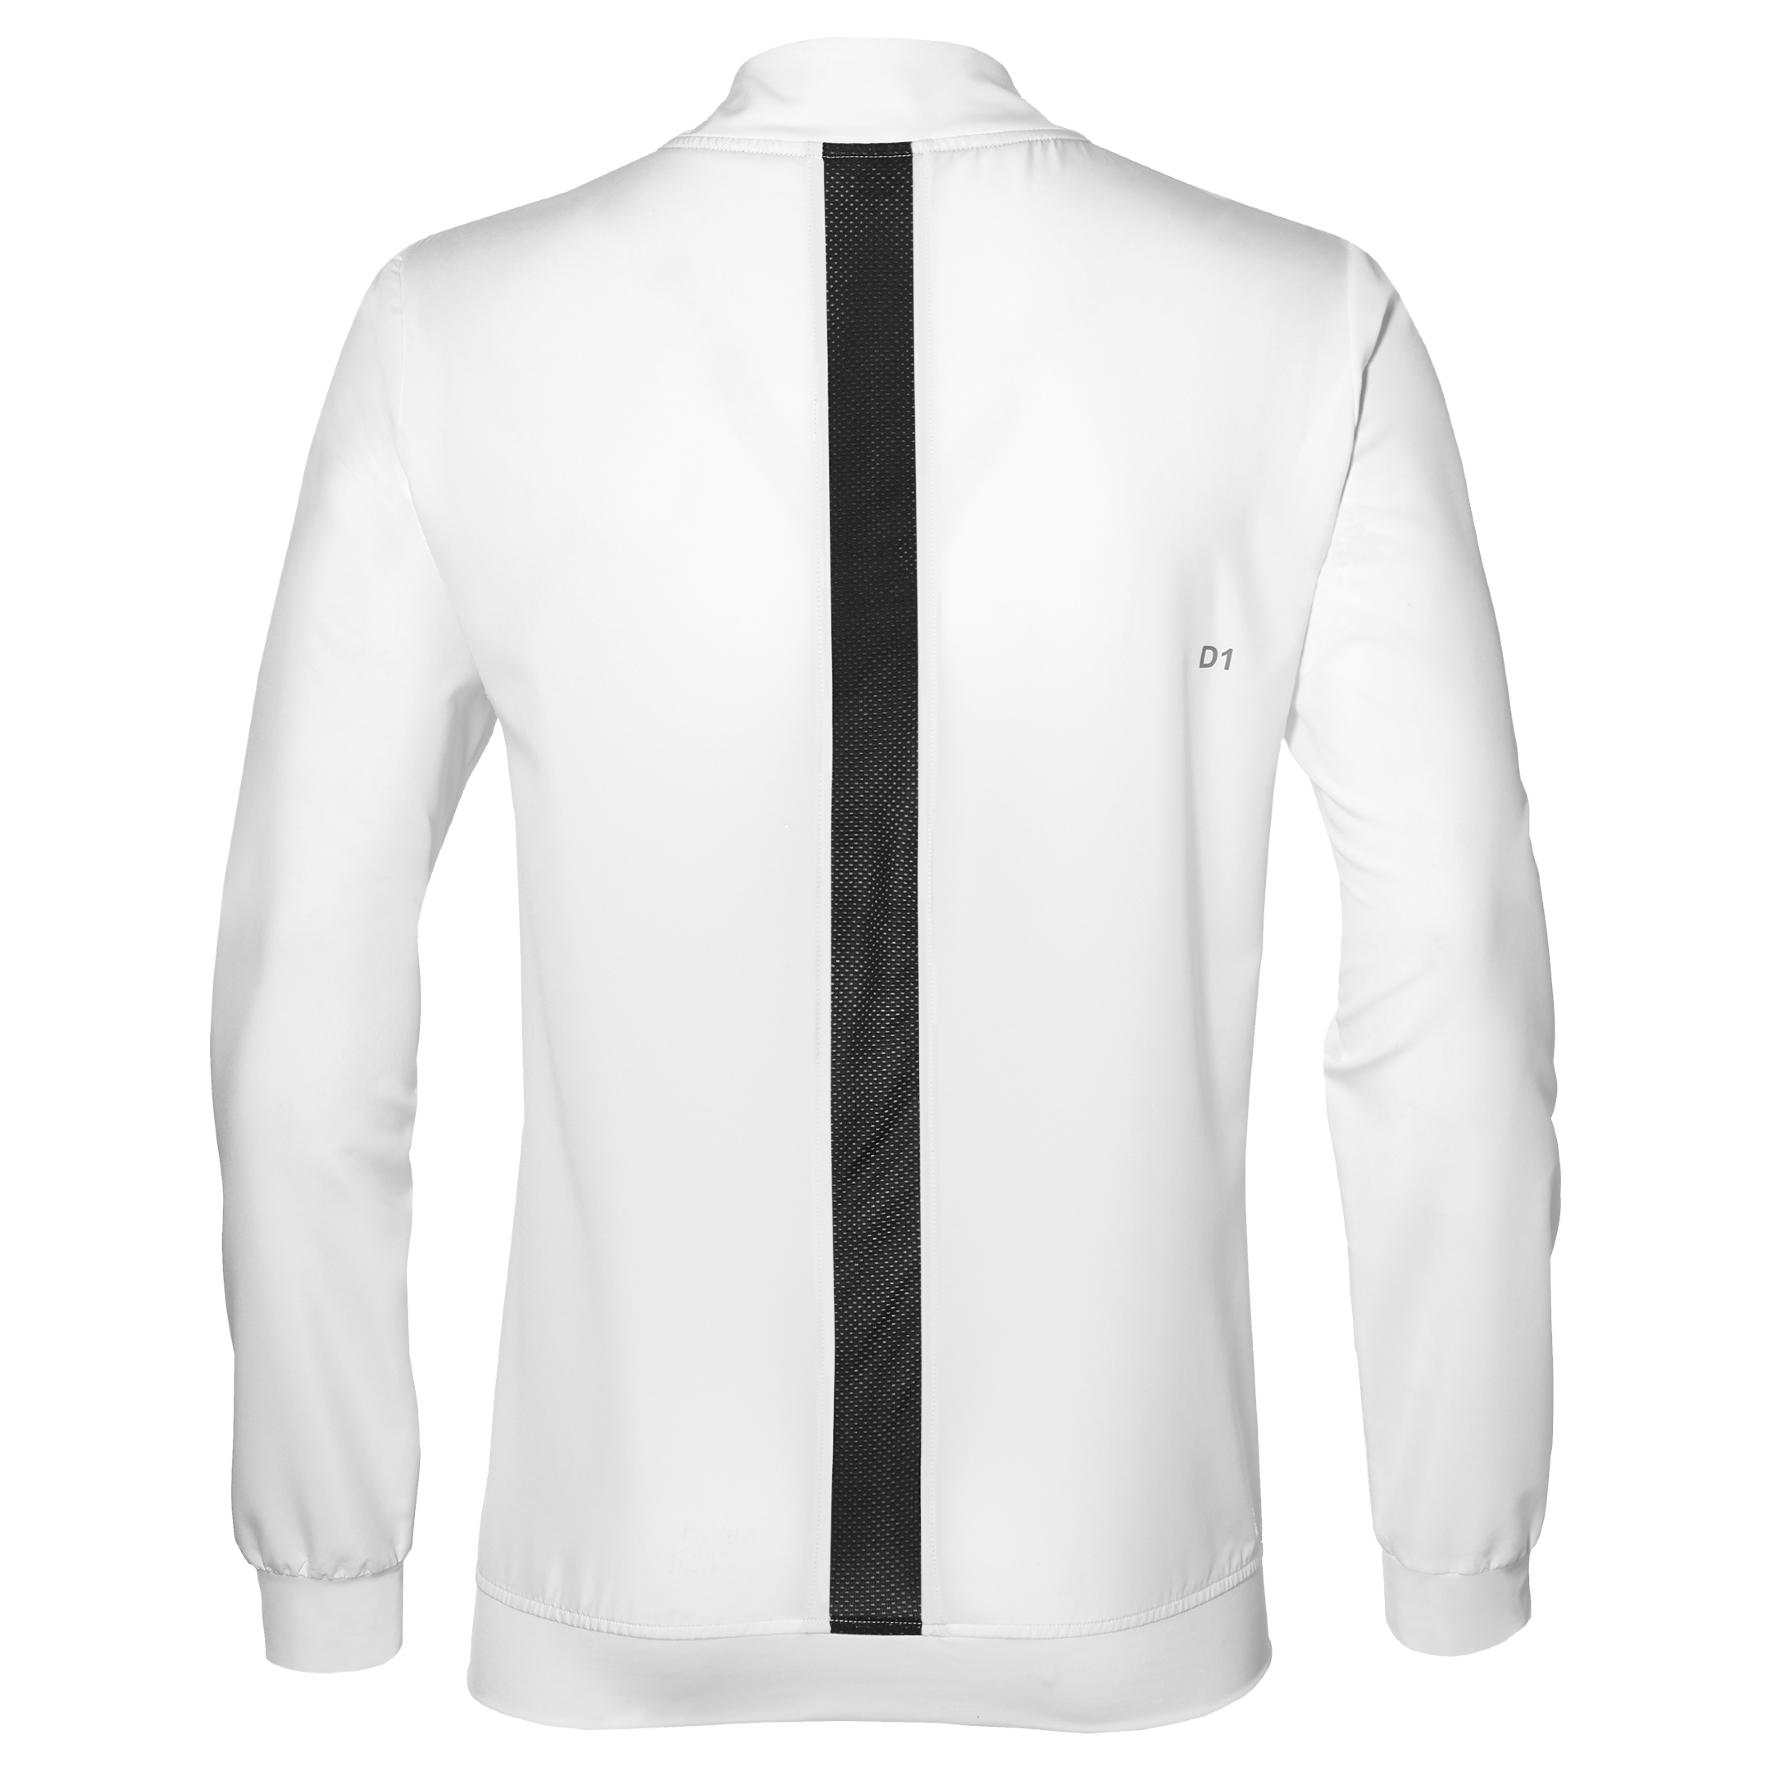 ededab0e19f411 Asics Tennis Jacket - Herren Tennis Jacke - 154410-0014 weiß Jogging ...